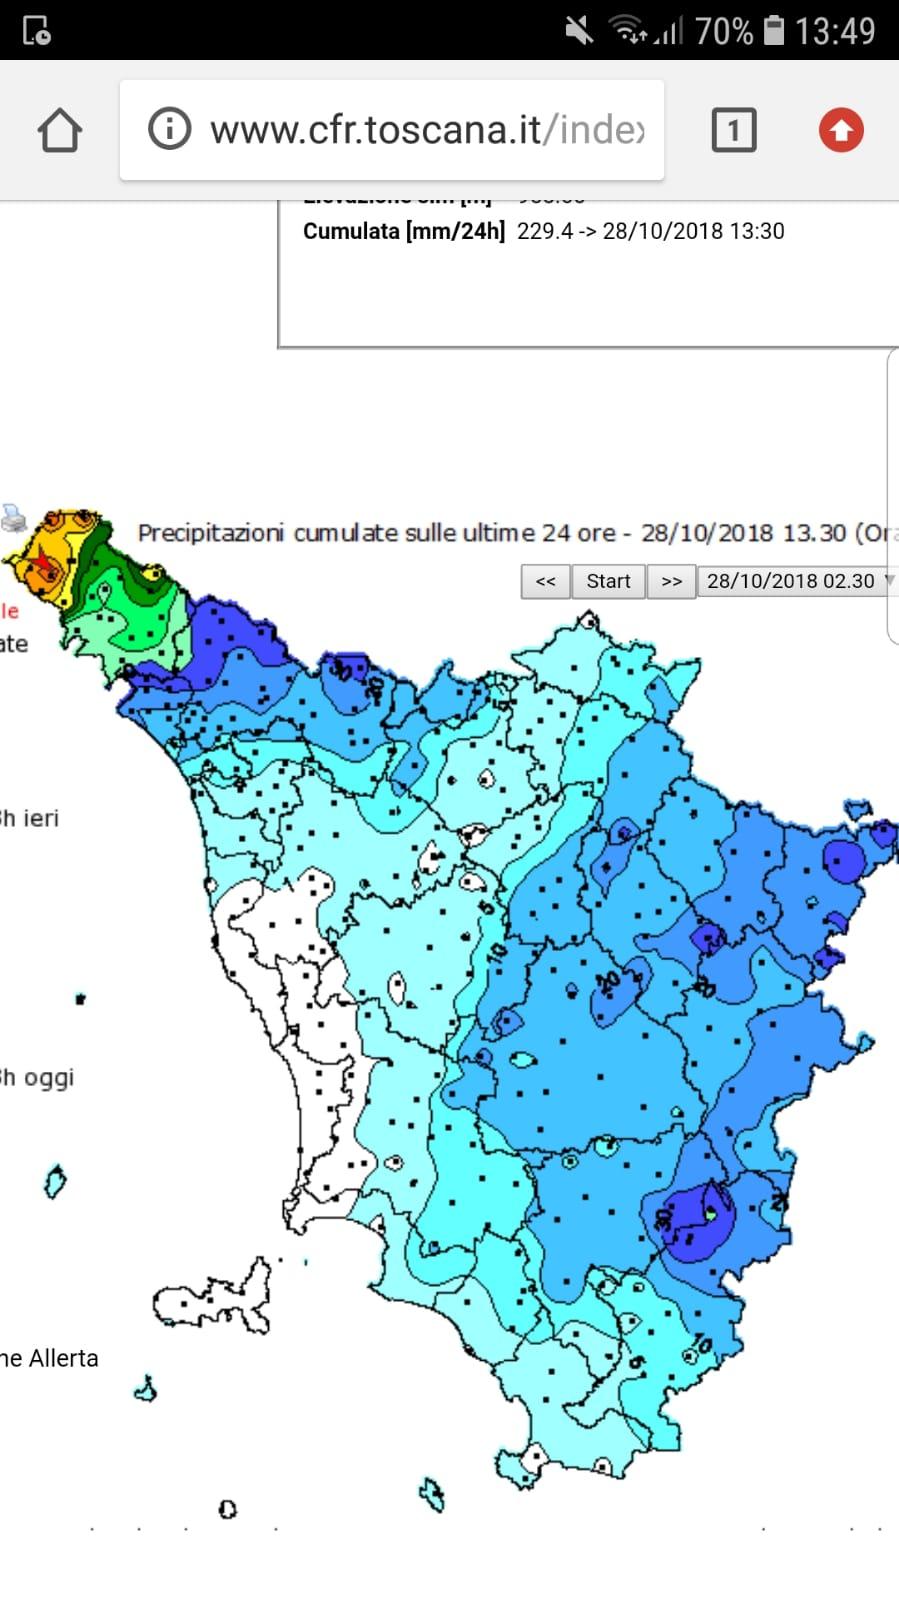 Toscana 22- 30 Ottobre 2018-img-20181028-wa0054.jpg